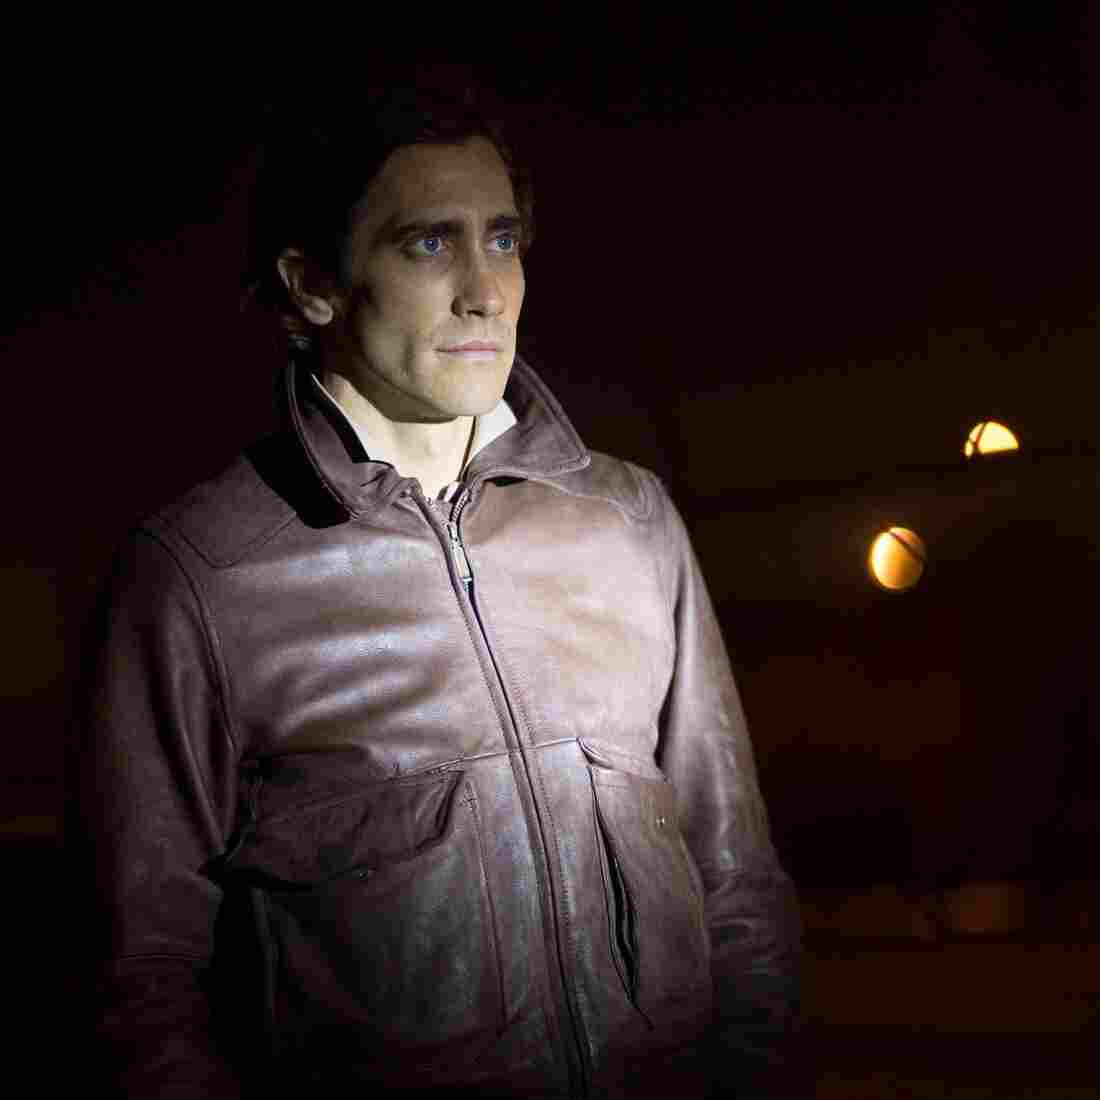 'Nightcrawler' Jake Gyllenhaal: We're All Complicit In 'If It Bleeds, It Leads'